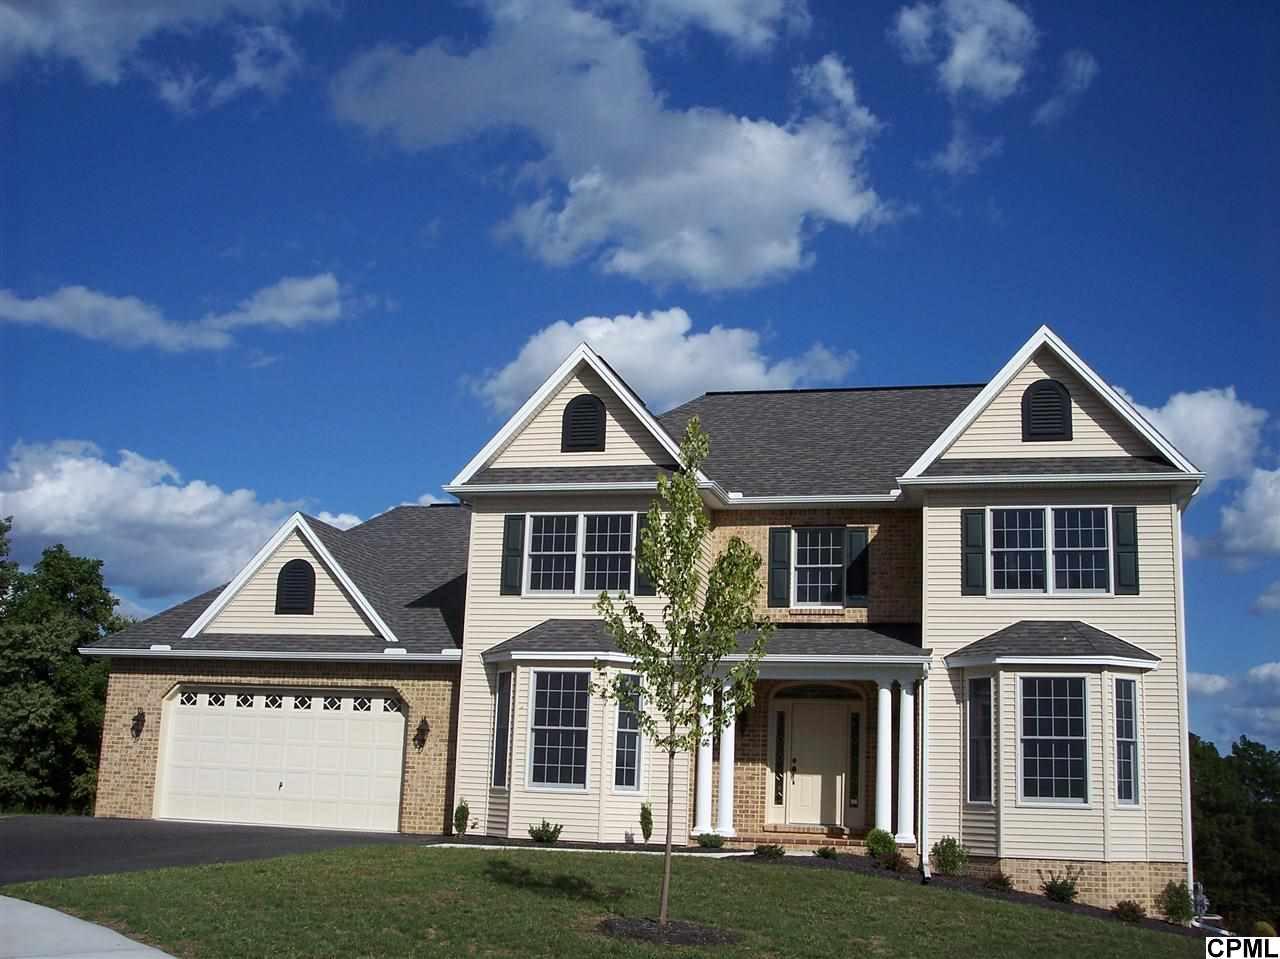 Rental Homes for Rent, ListingId:30310632, location: 6107 Embers Lane Harrisburg 17109